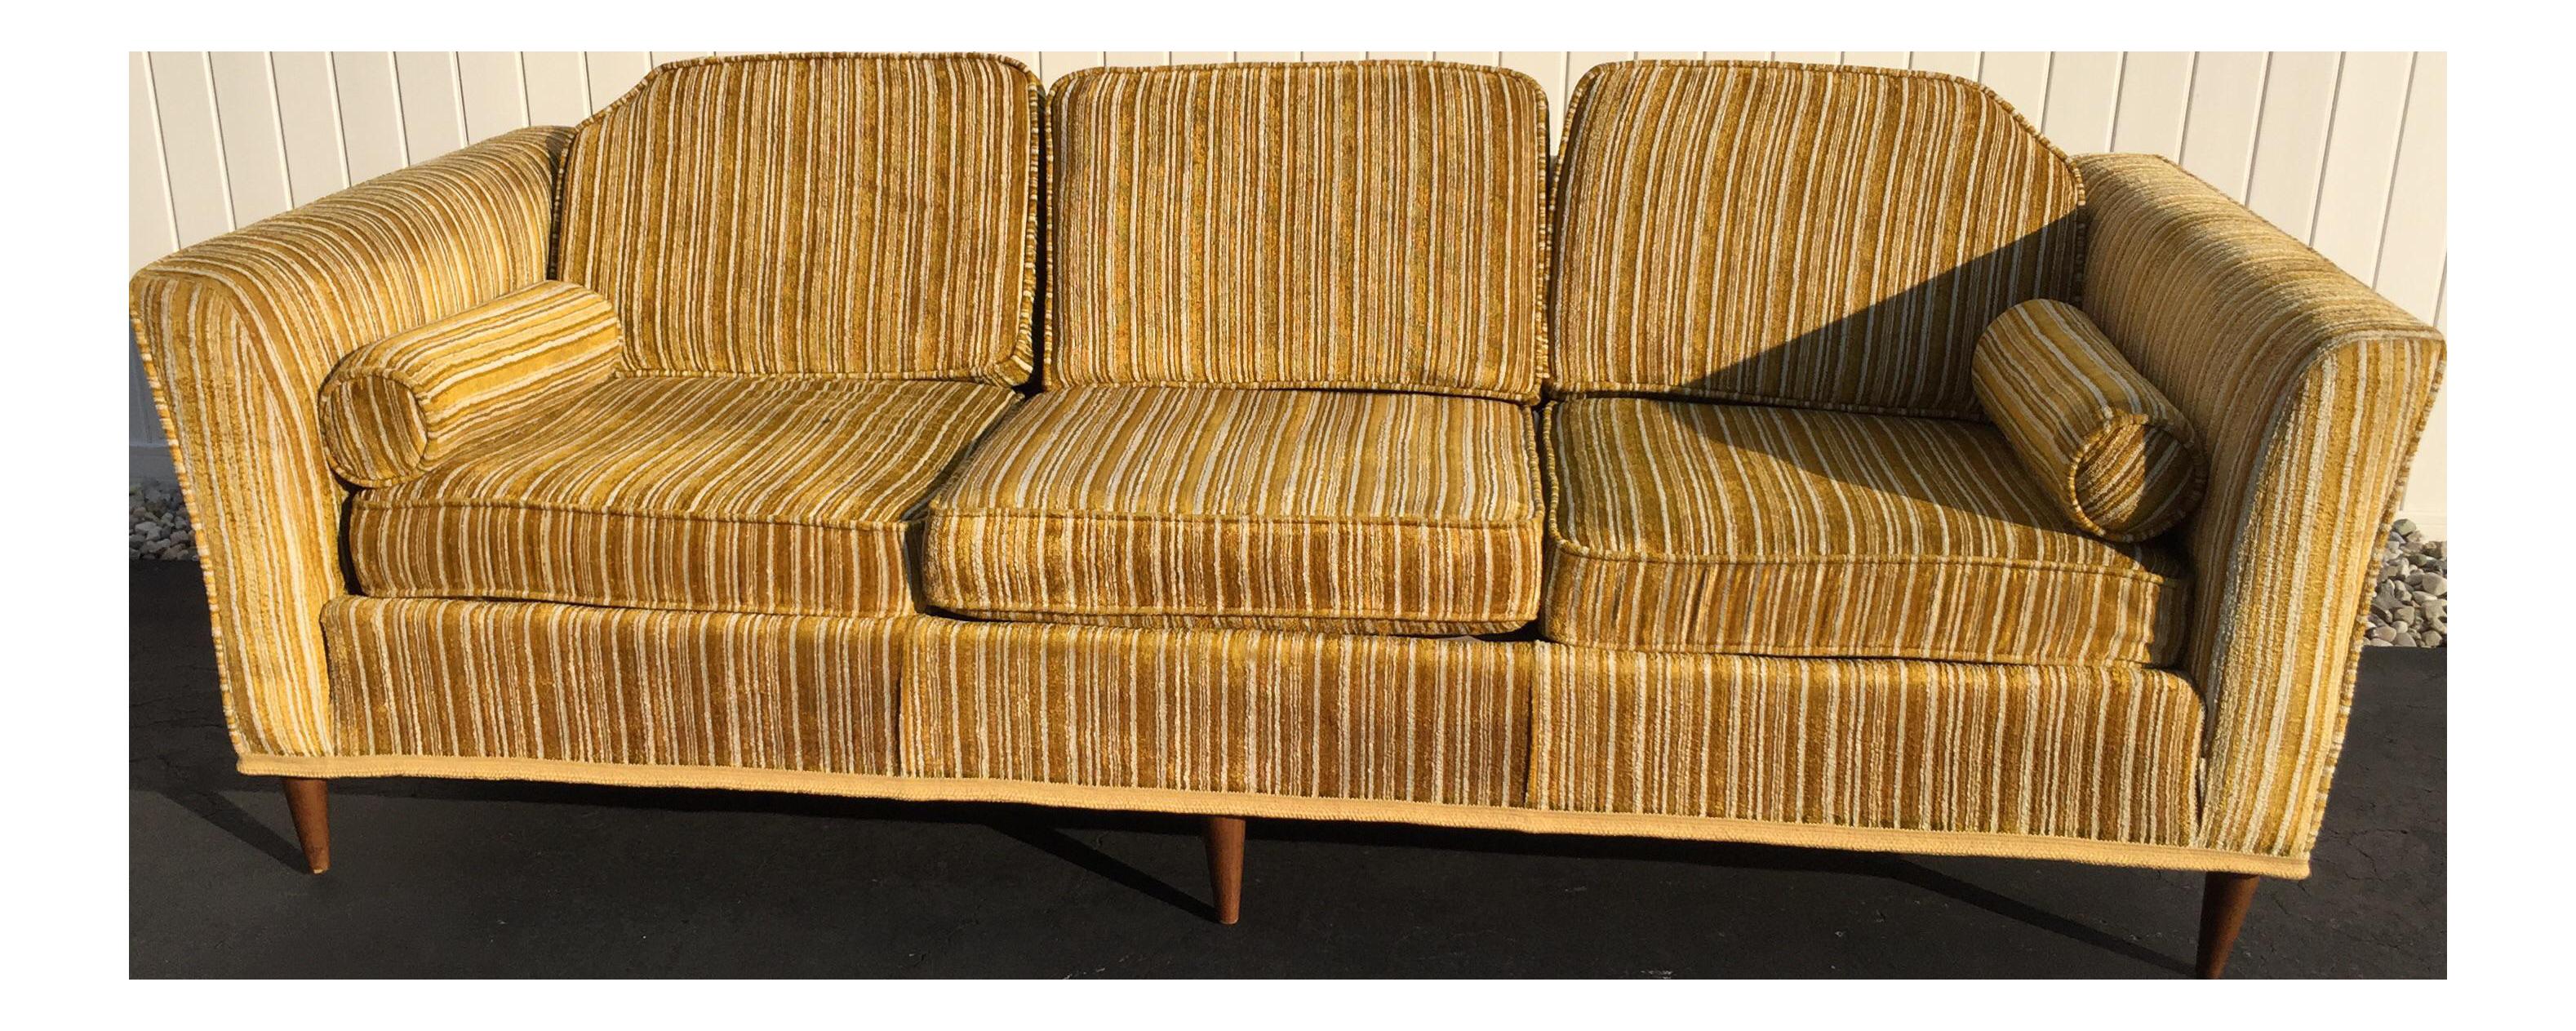 Superb Kroehler Royale Mid Century Gold Striped Sofa